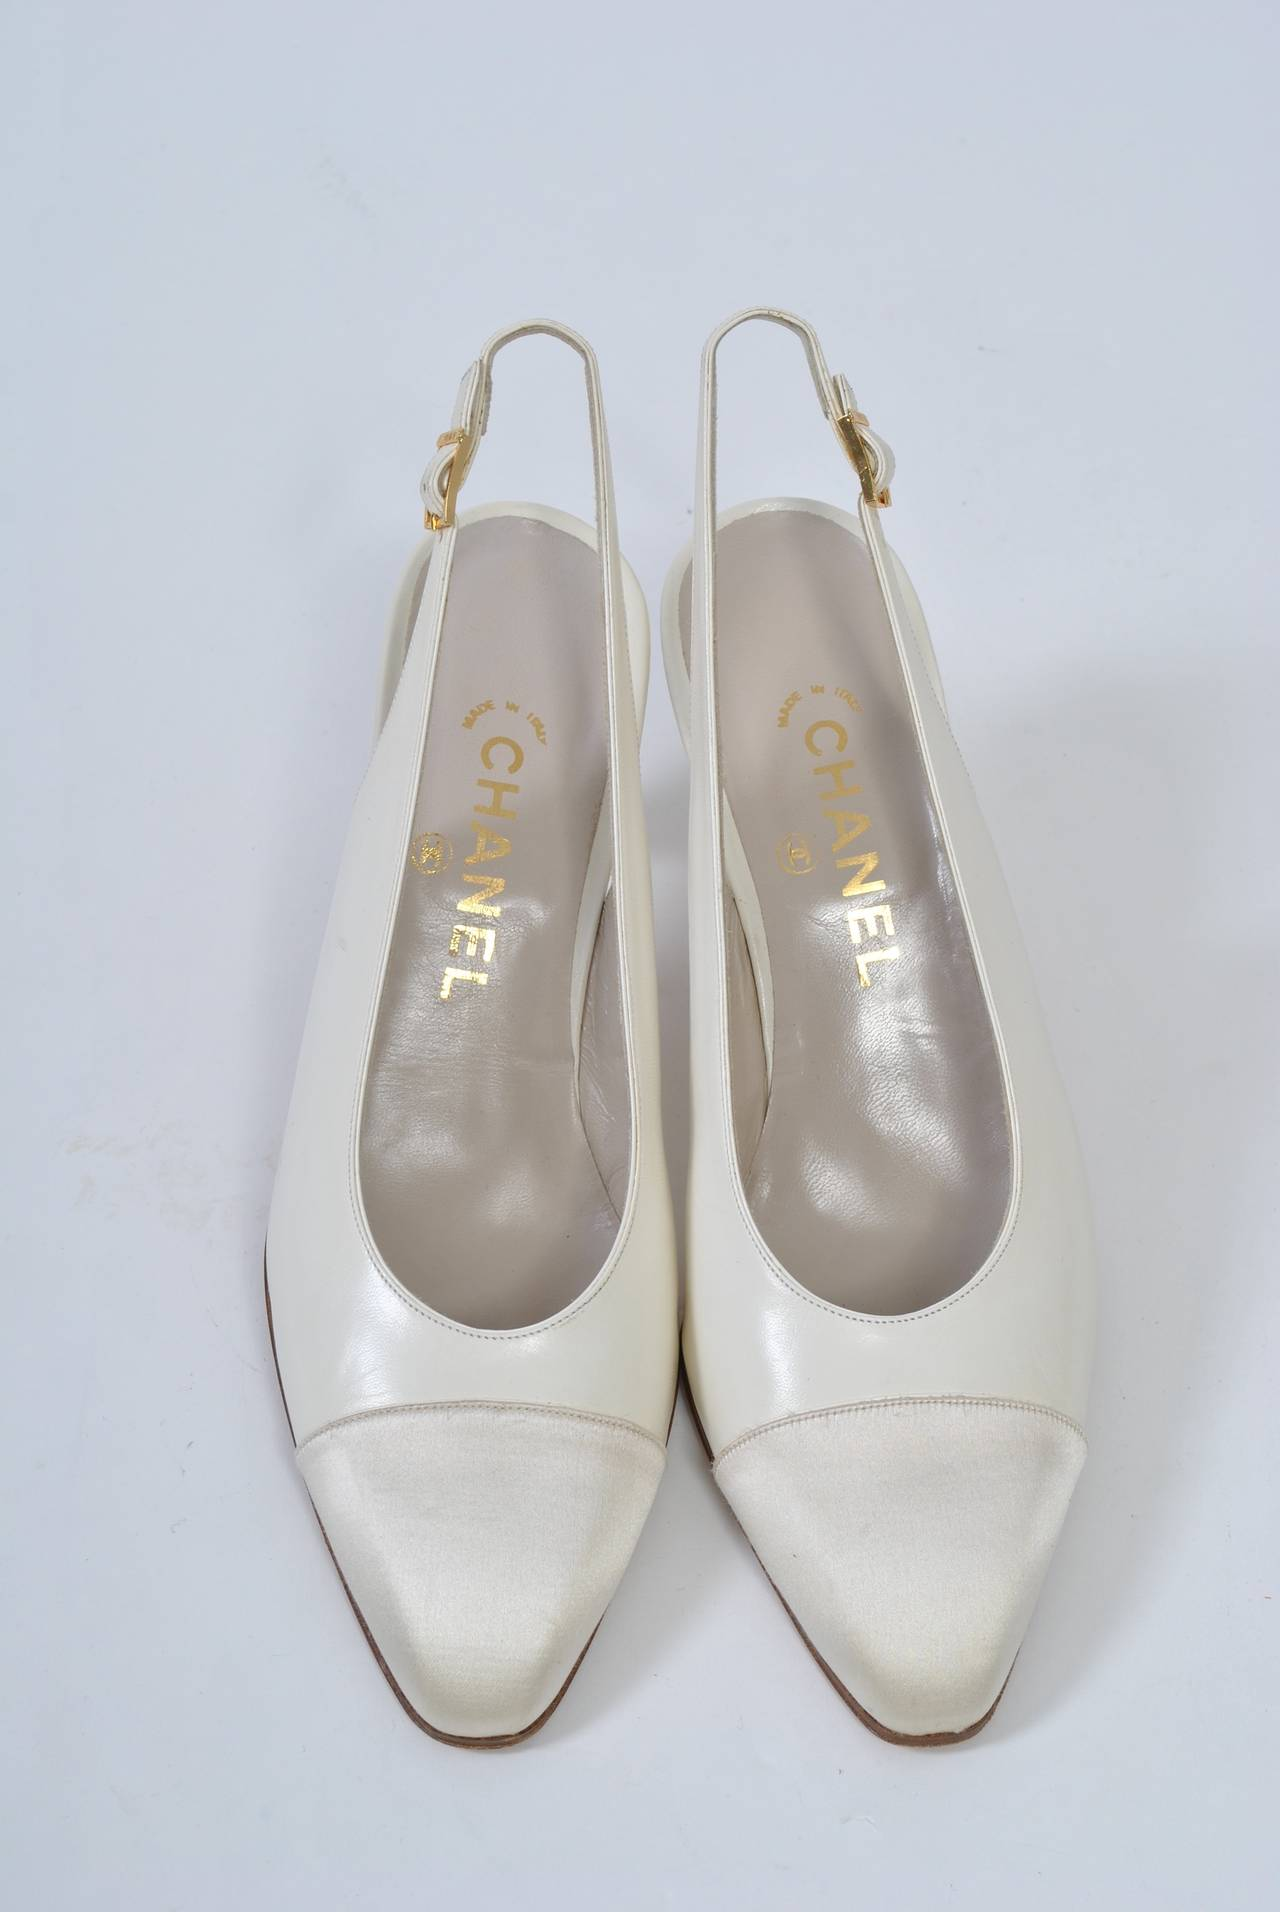 Chanel Satin Toe Slingbacks 5